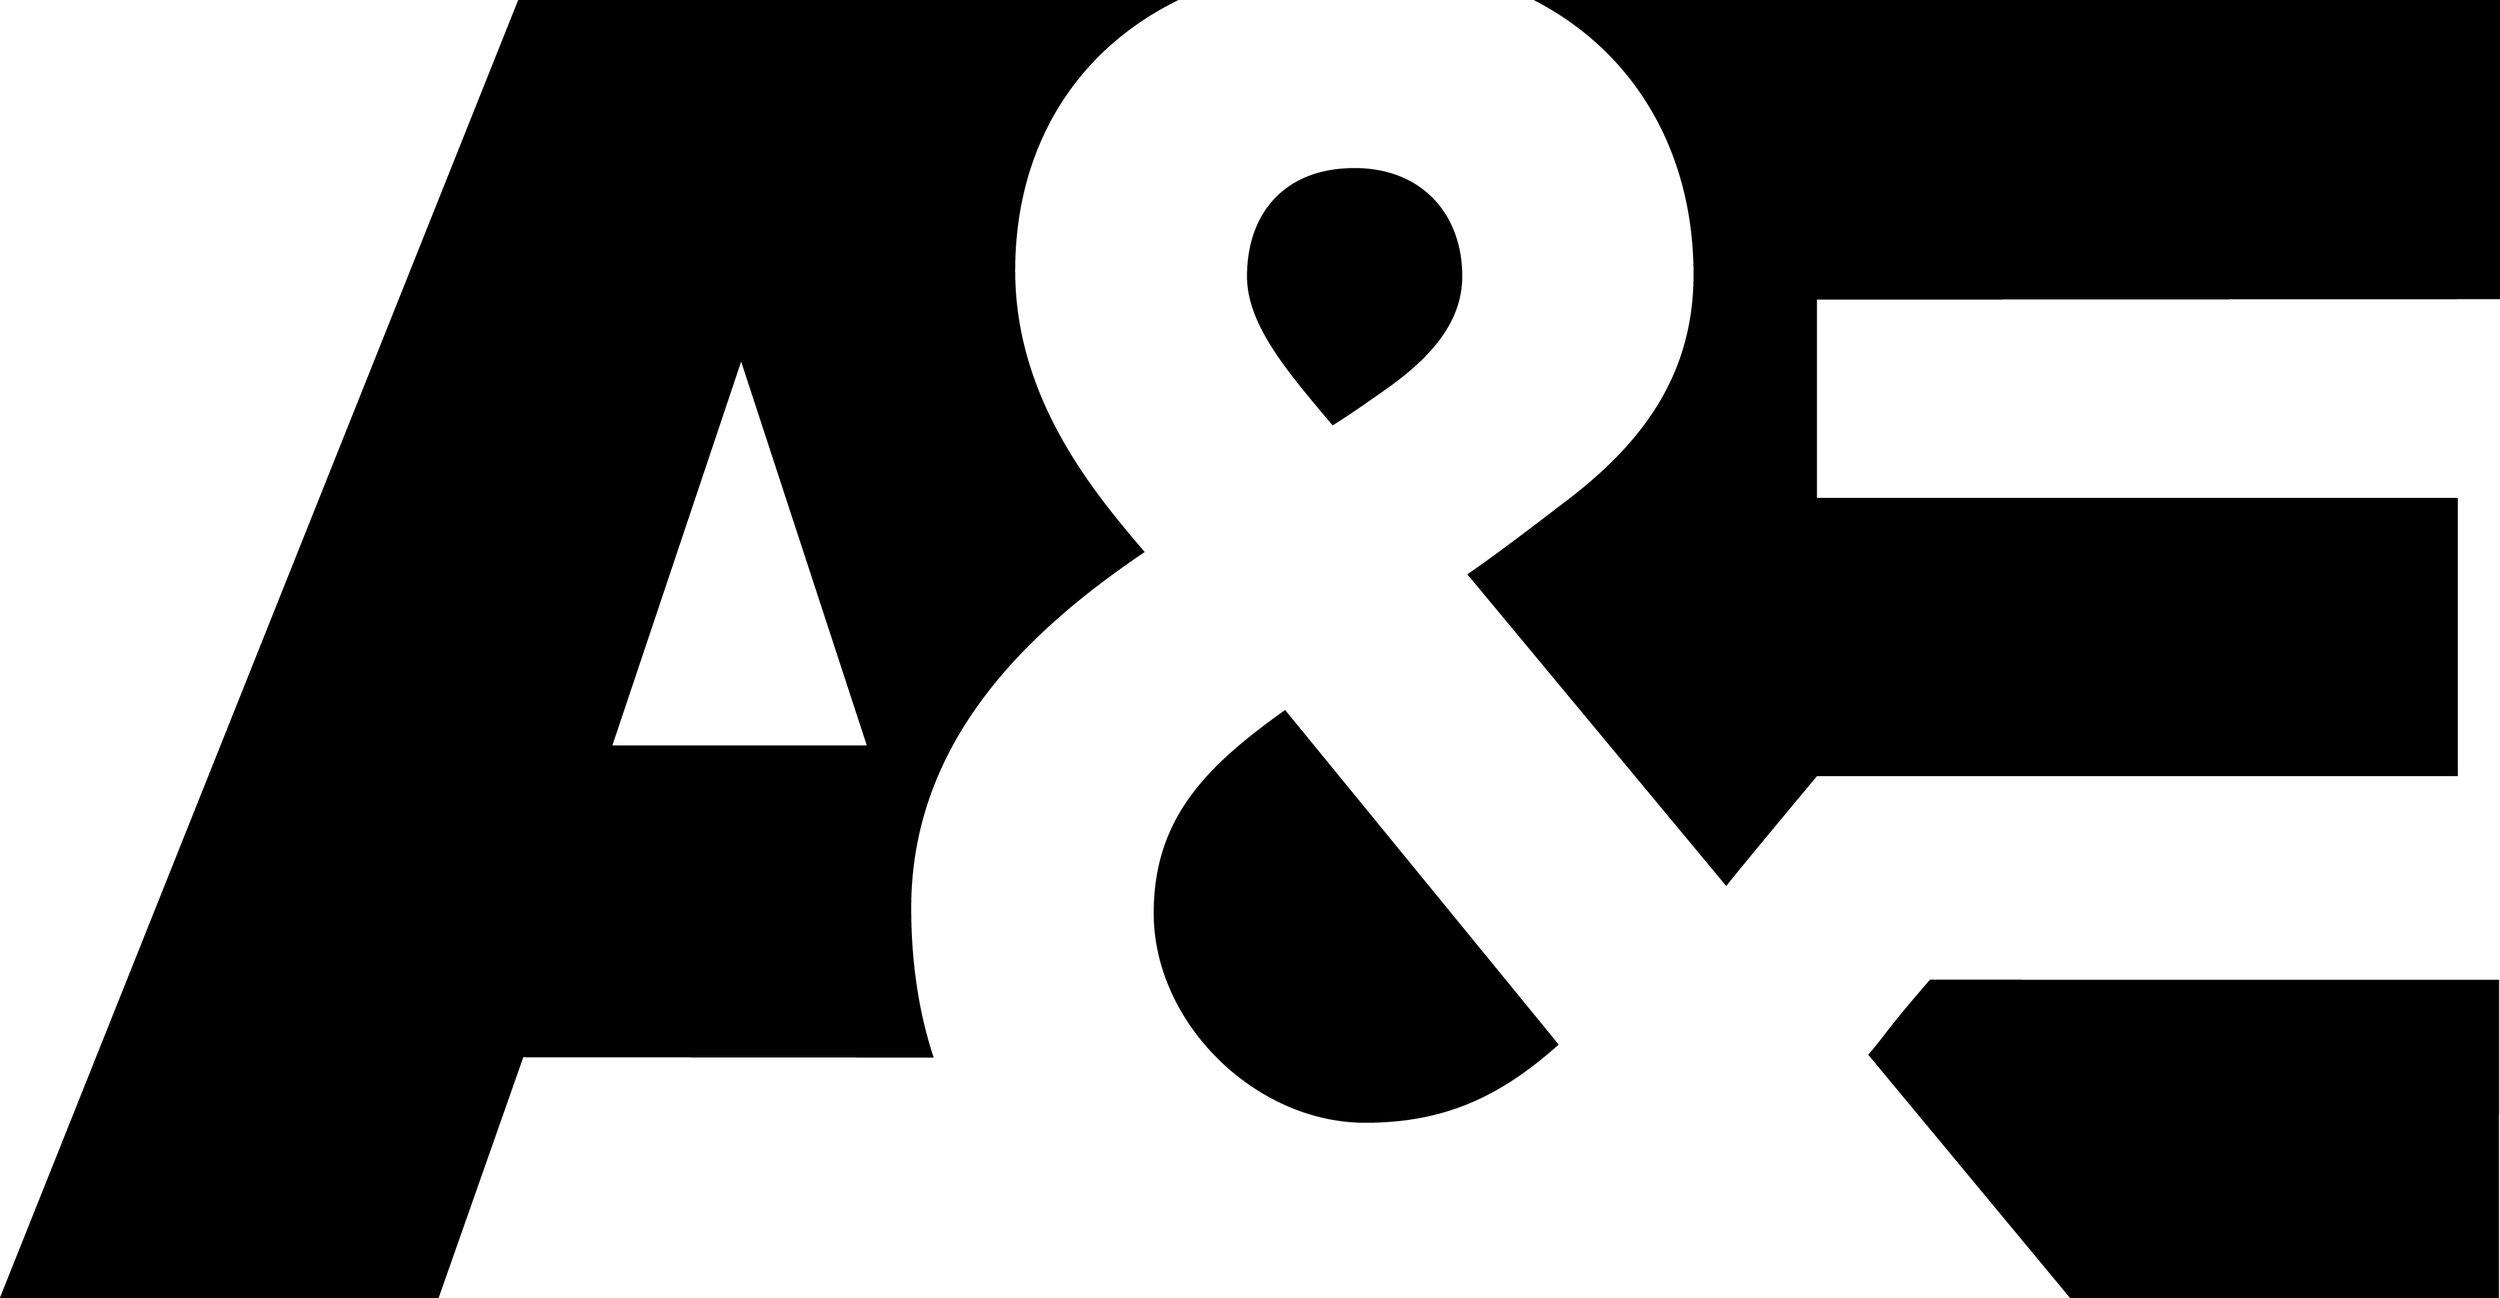 A&E_Network_logo.jpg